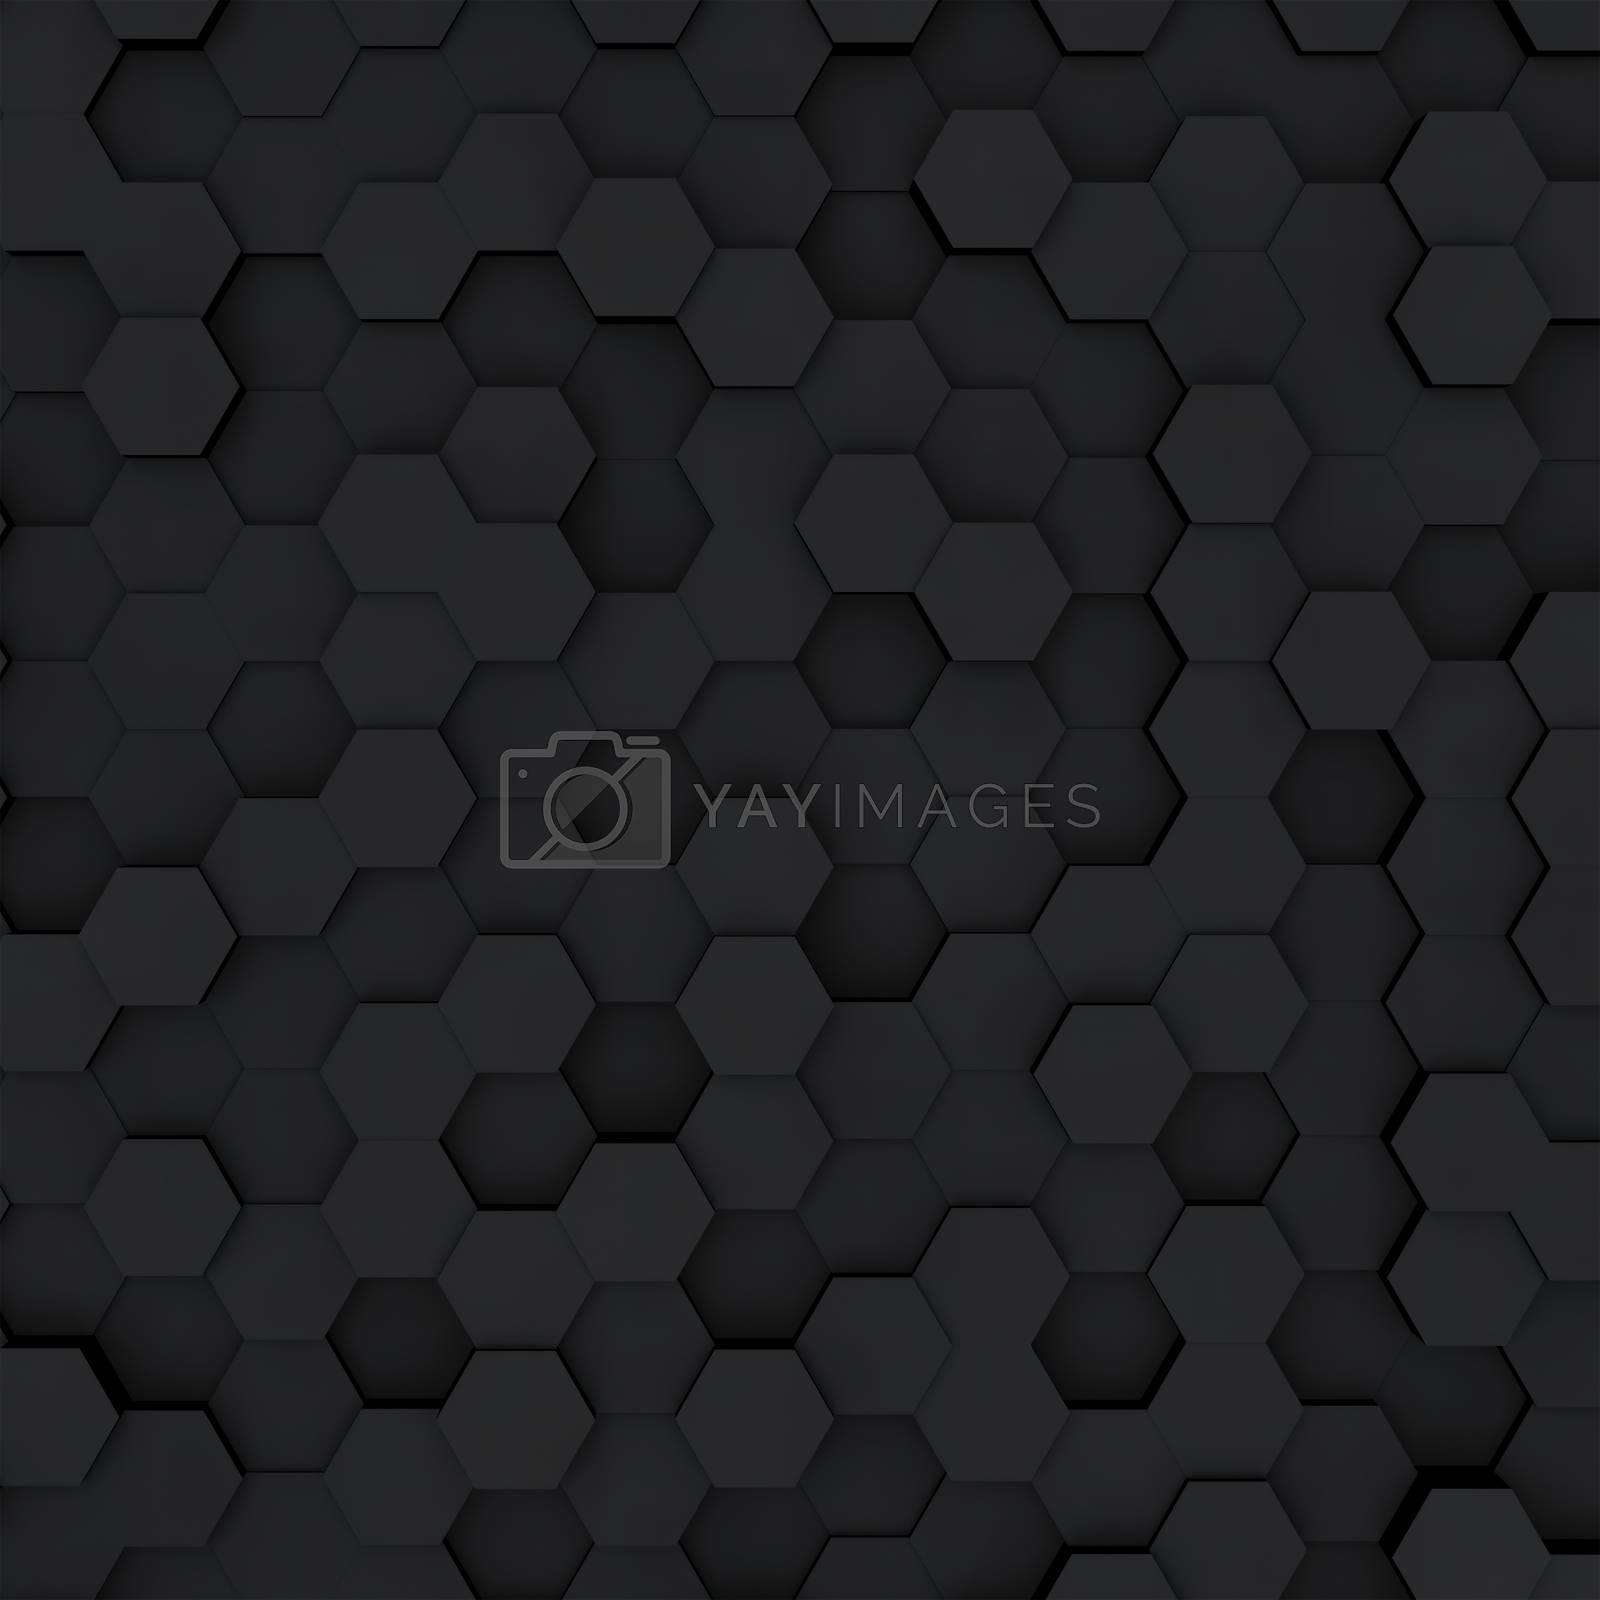 Dark gray hexagon honeycombs abstract background by merzavka